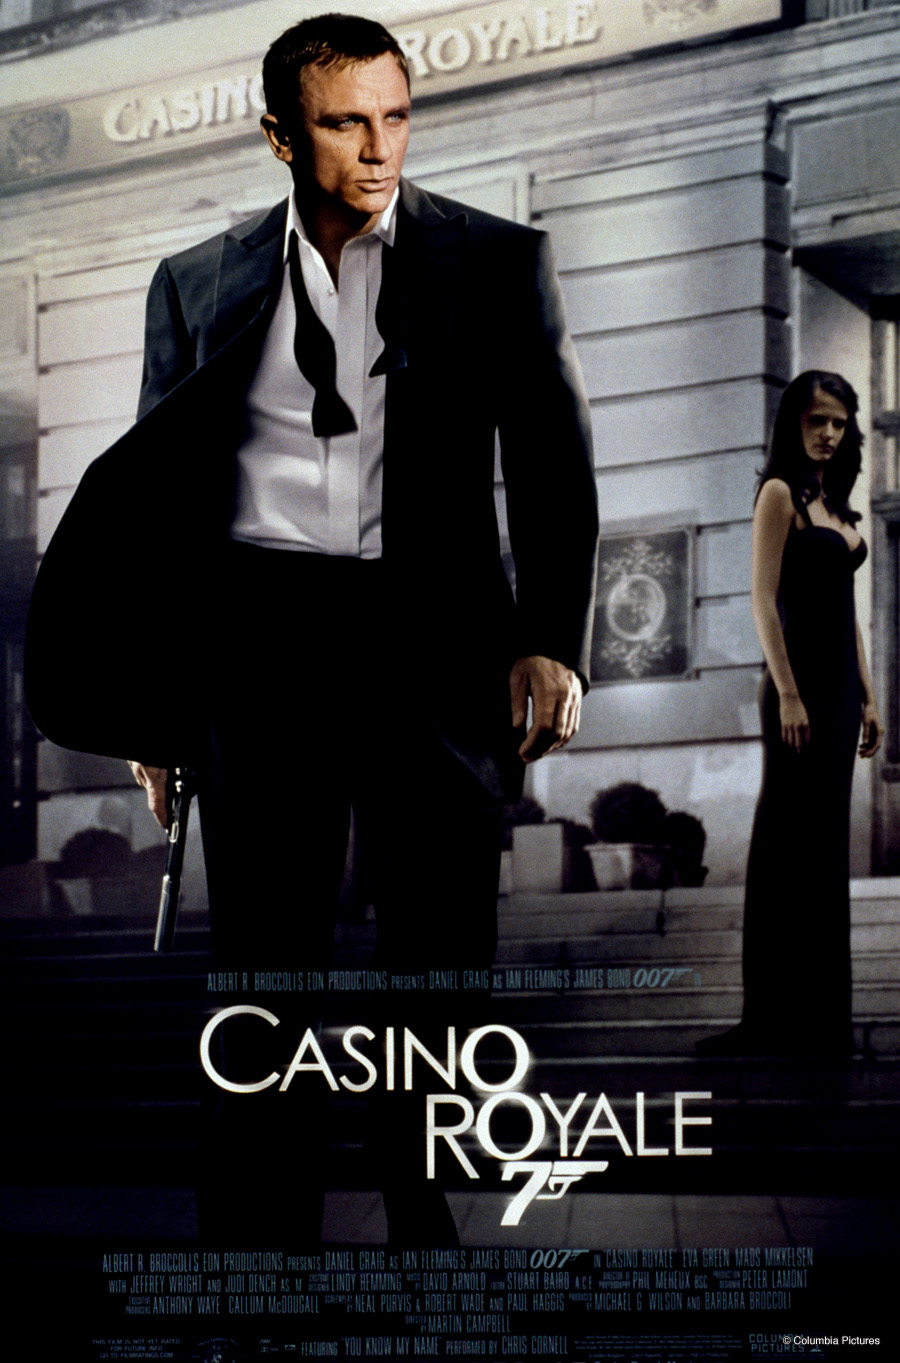 Buy casino royale poster bet black casino casino gambling jack play yourbestonlinecasino.com